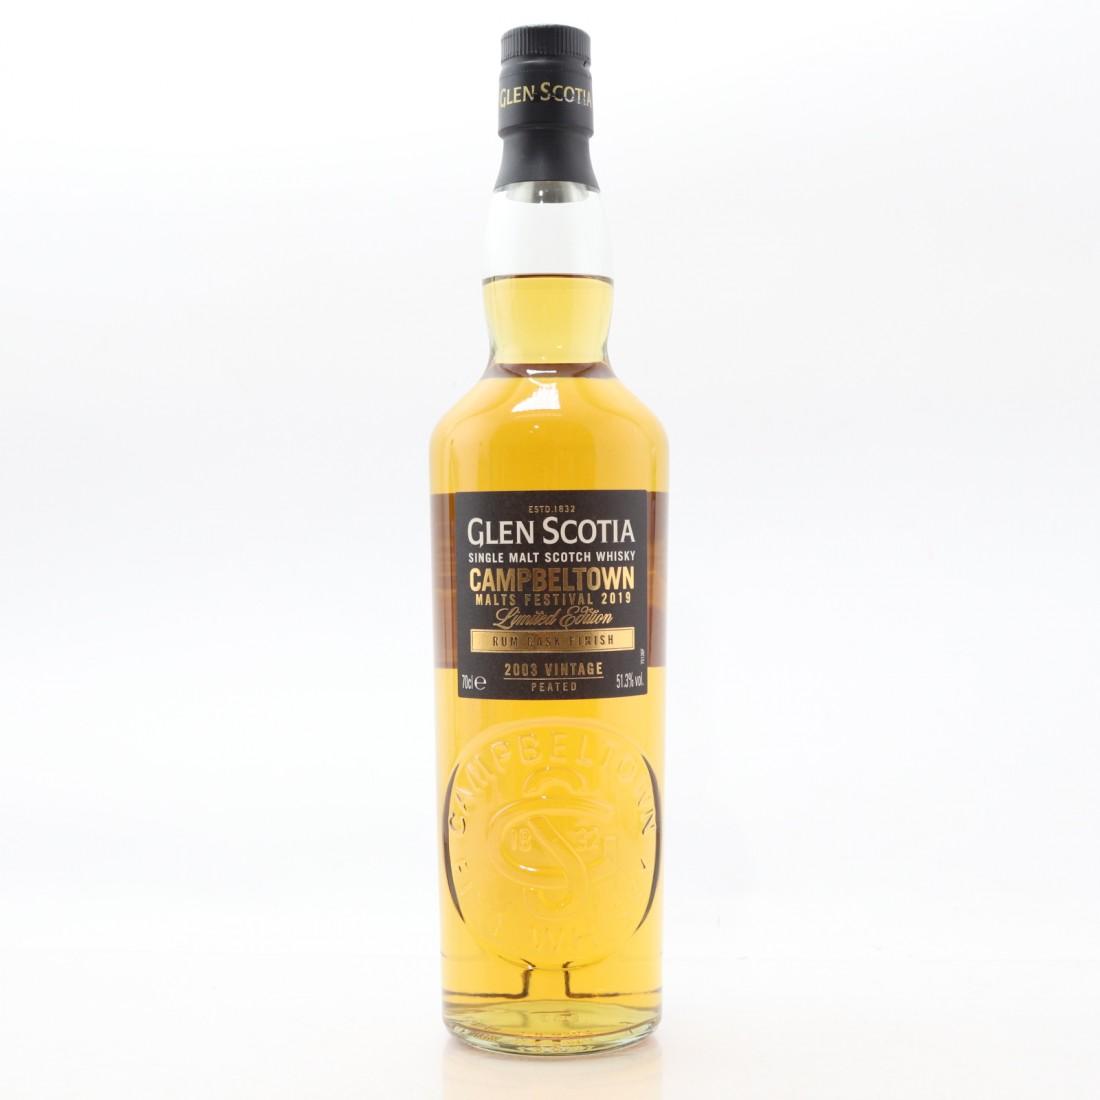 Glen Scotia 2003 Rum Cask Finish / Campbeltown Festival 2019